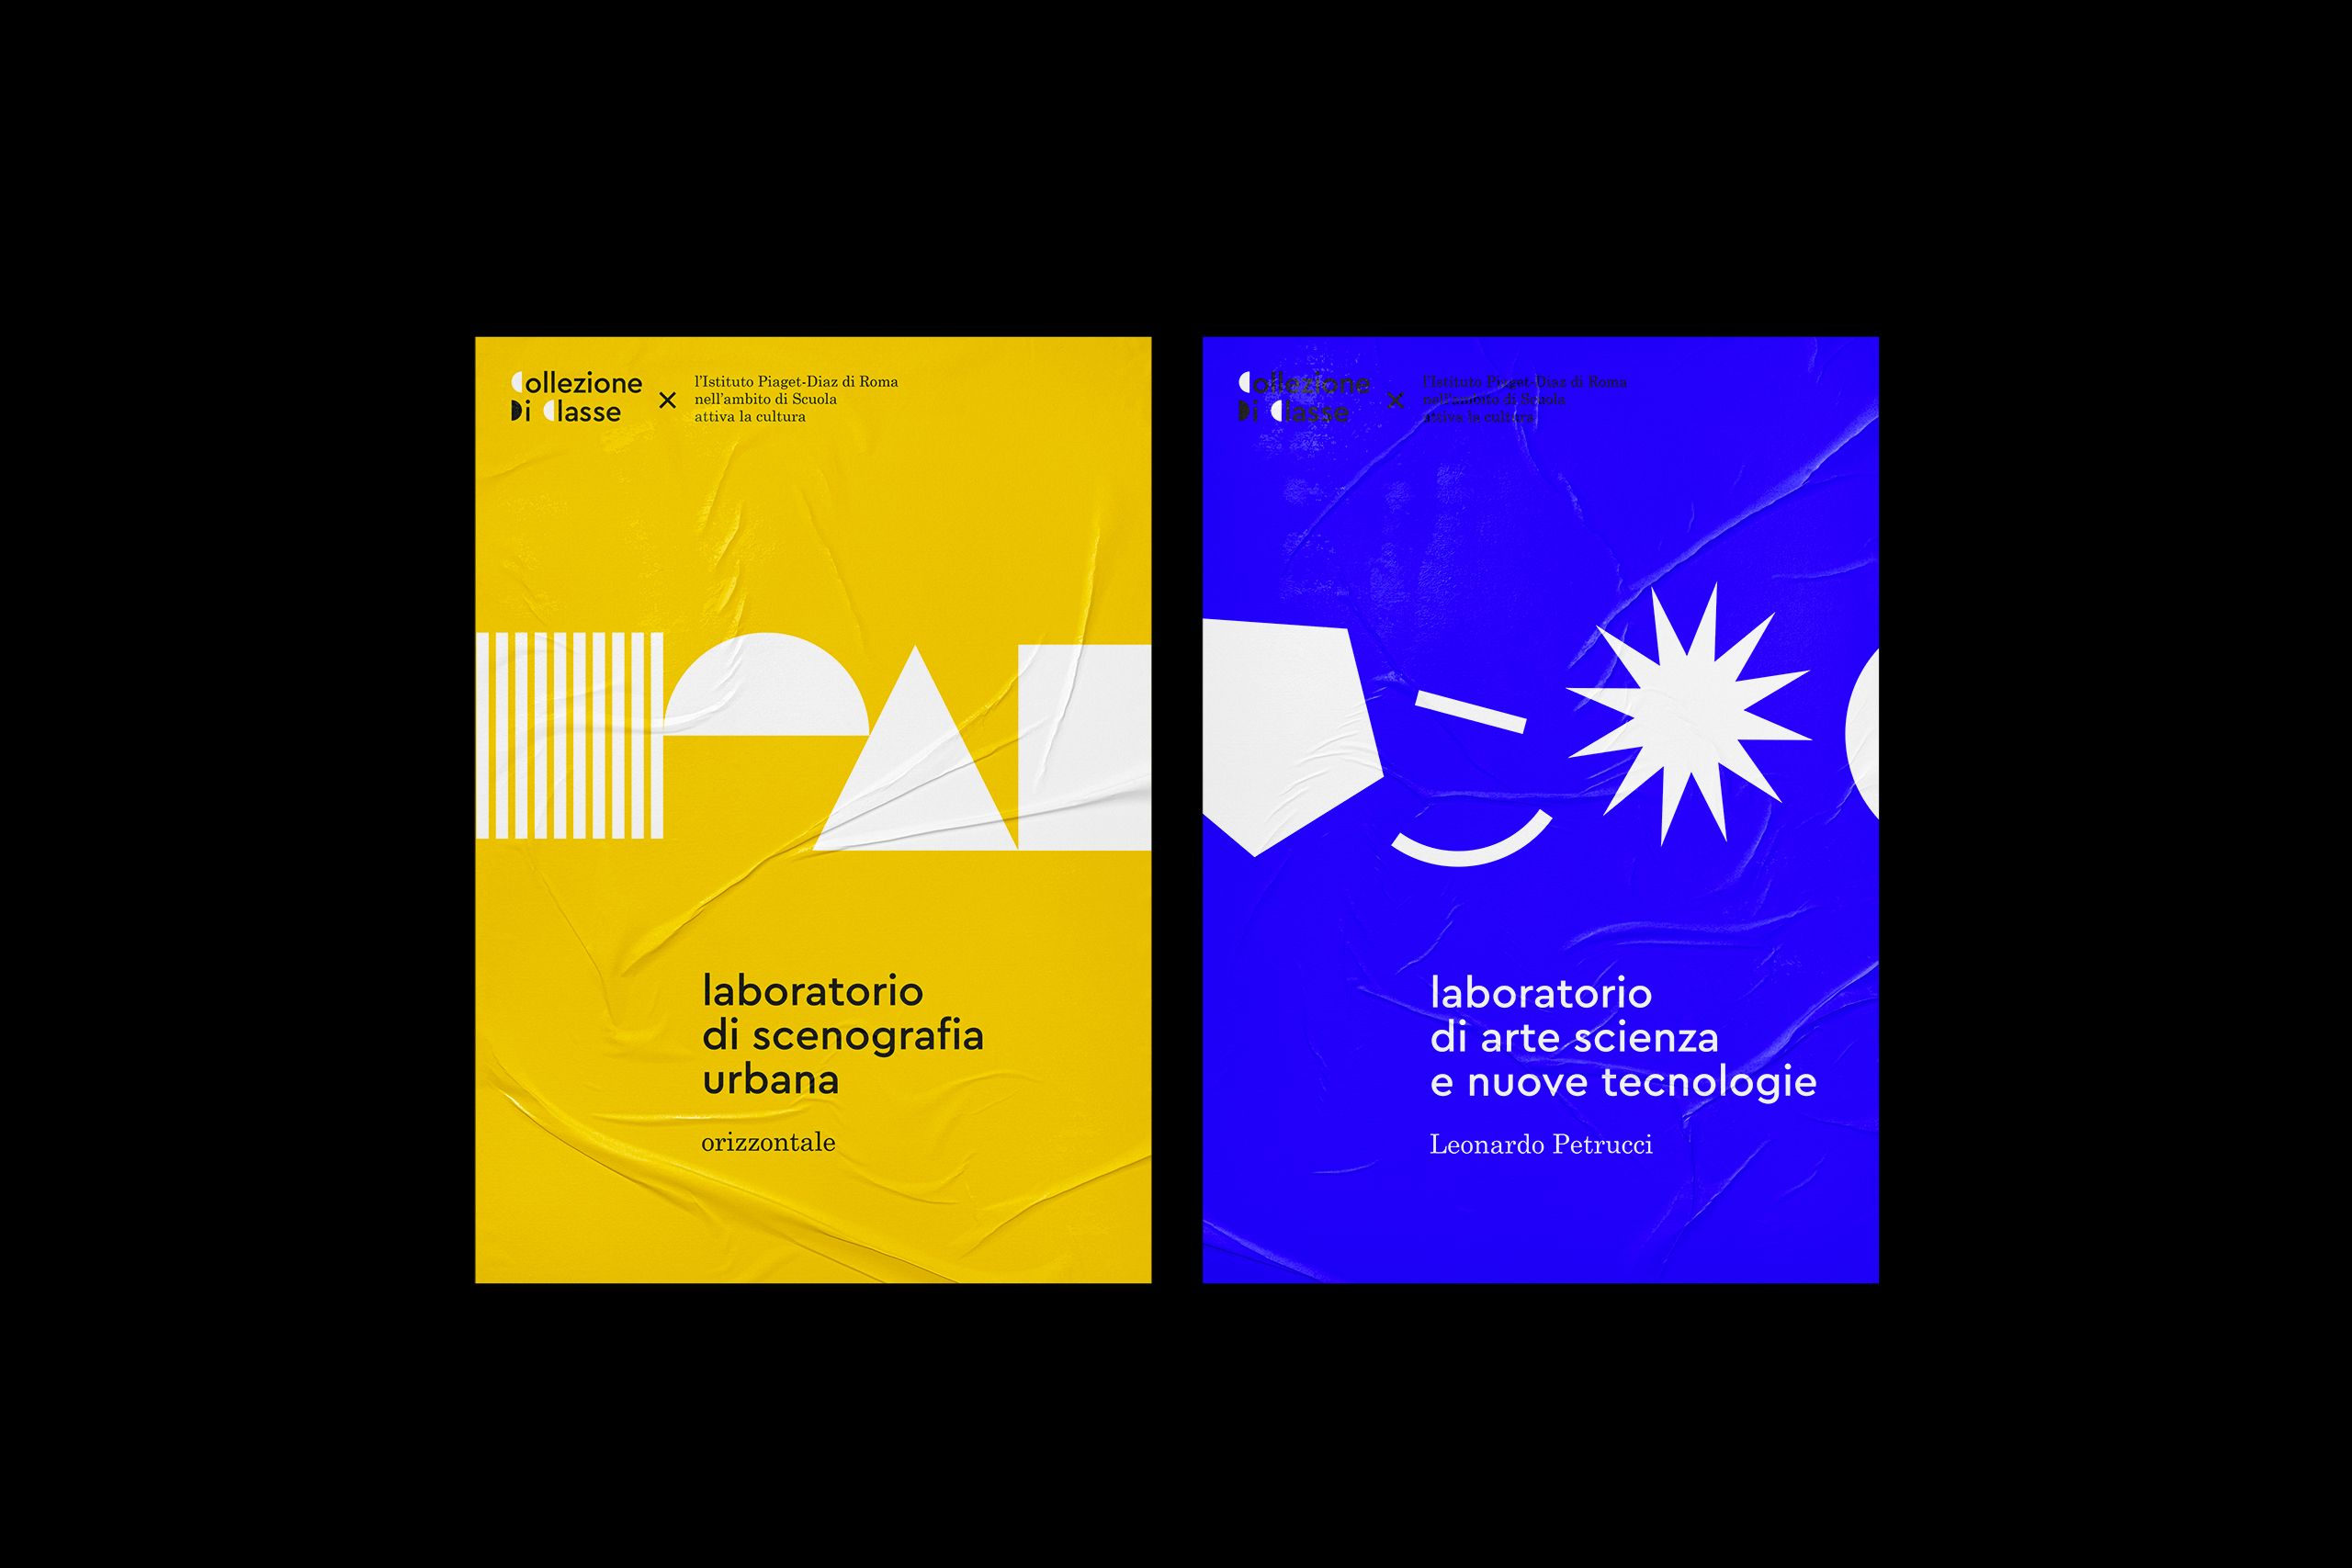 Giampiero_Quaini_collezionediclasse_poster_simboli_2